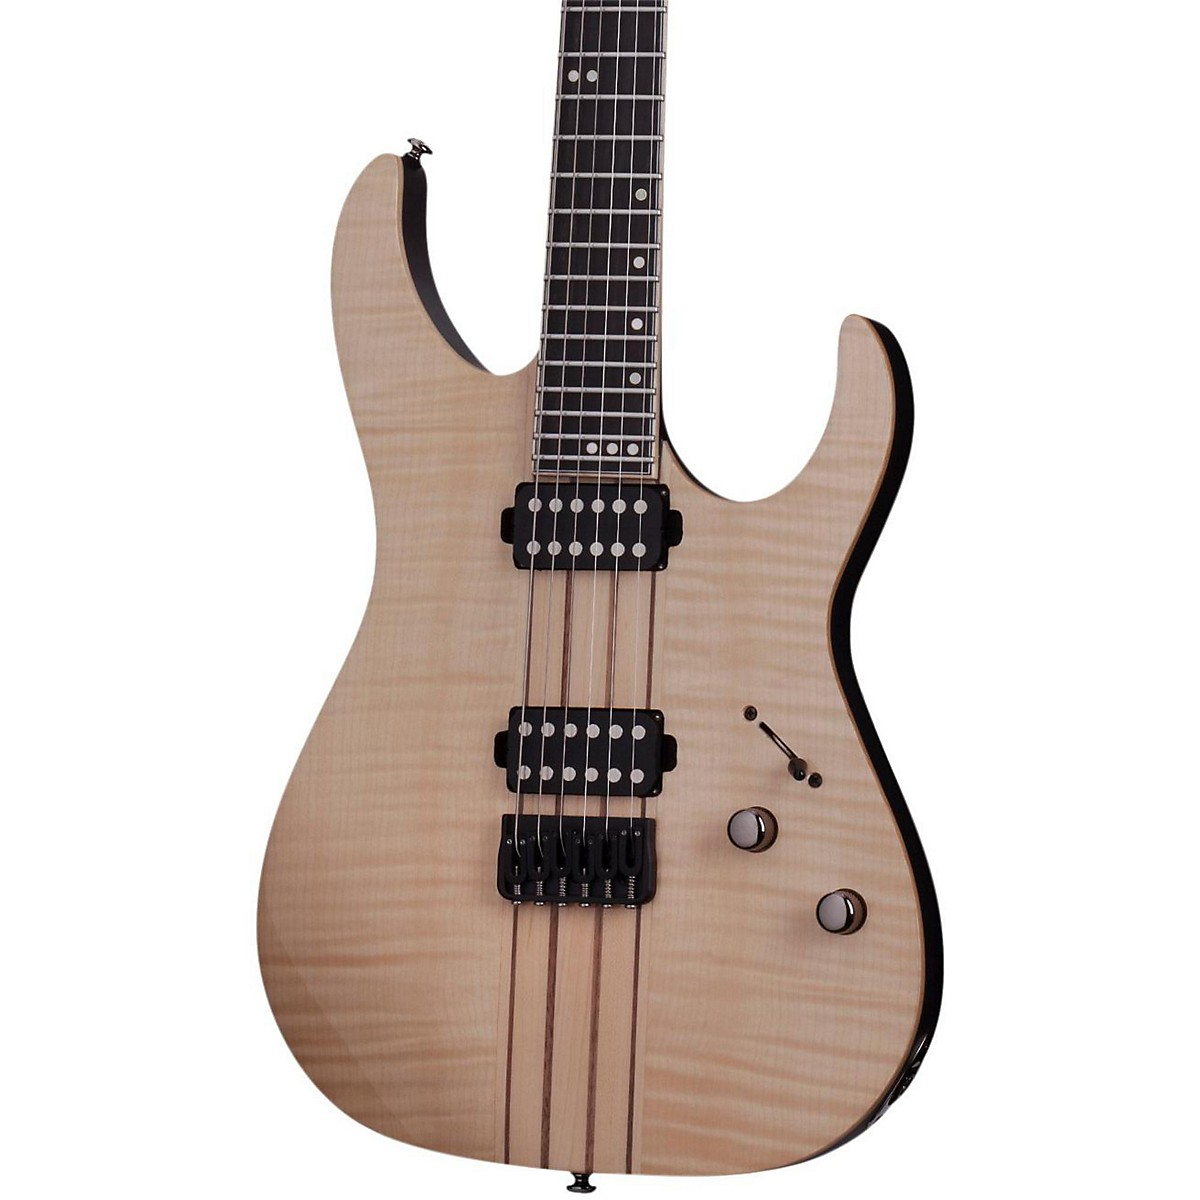 Schecter Guitar Research Banshee Elite-6 Electric Guitar